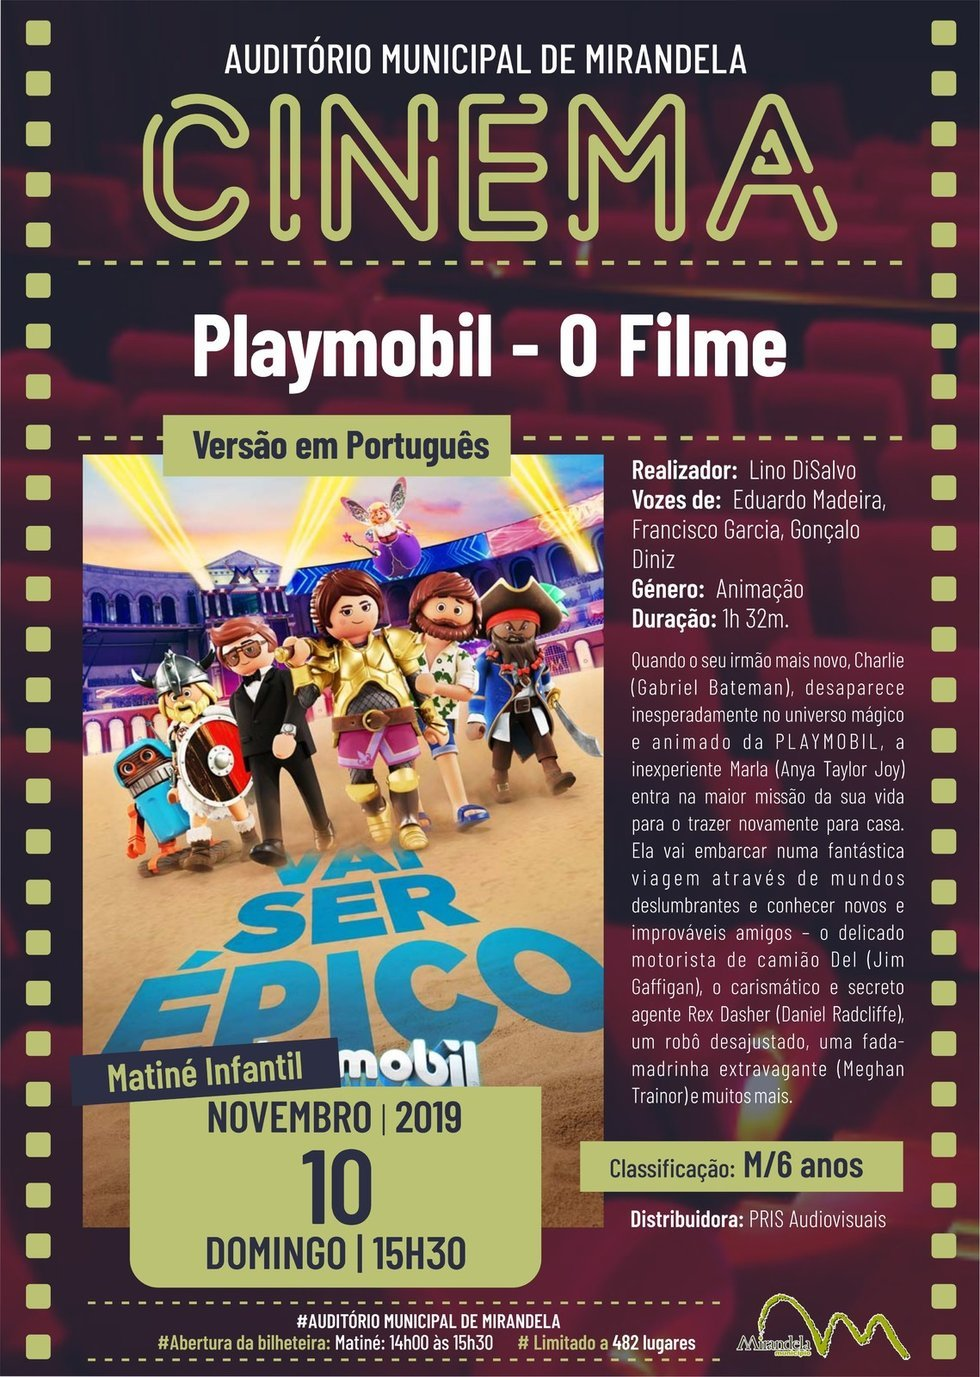 Cinema: Playmobil - O Filme